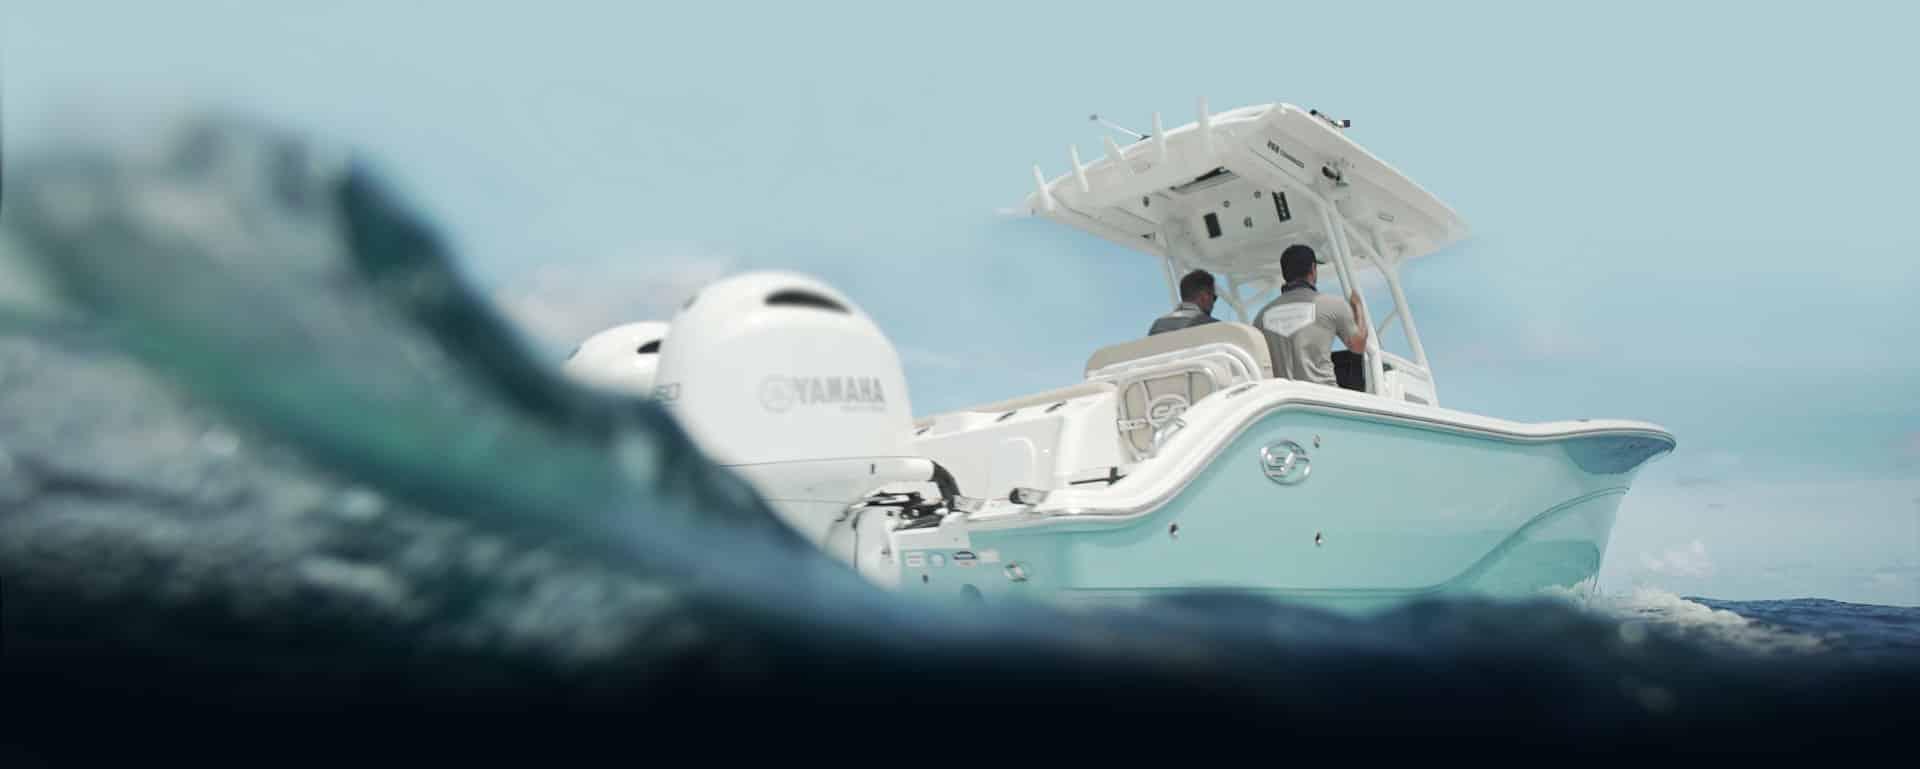 boat-img-07